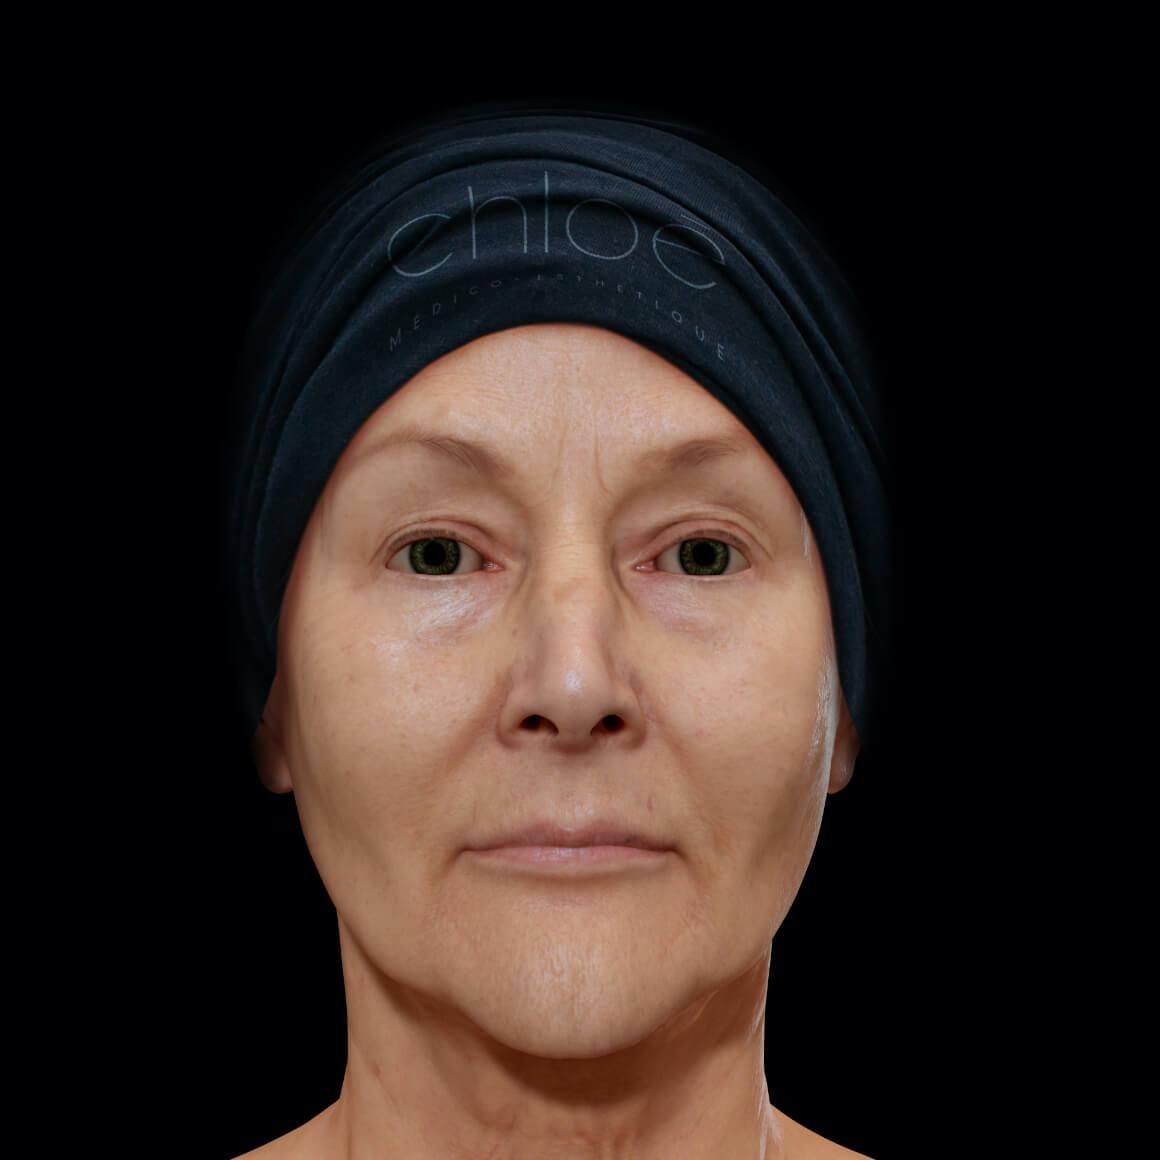 A Clinique Chloé female patient facing front after IPL photorejuvenation treatments for pigmented lesions, or dark spots